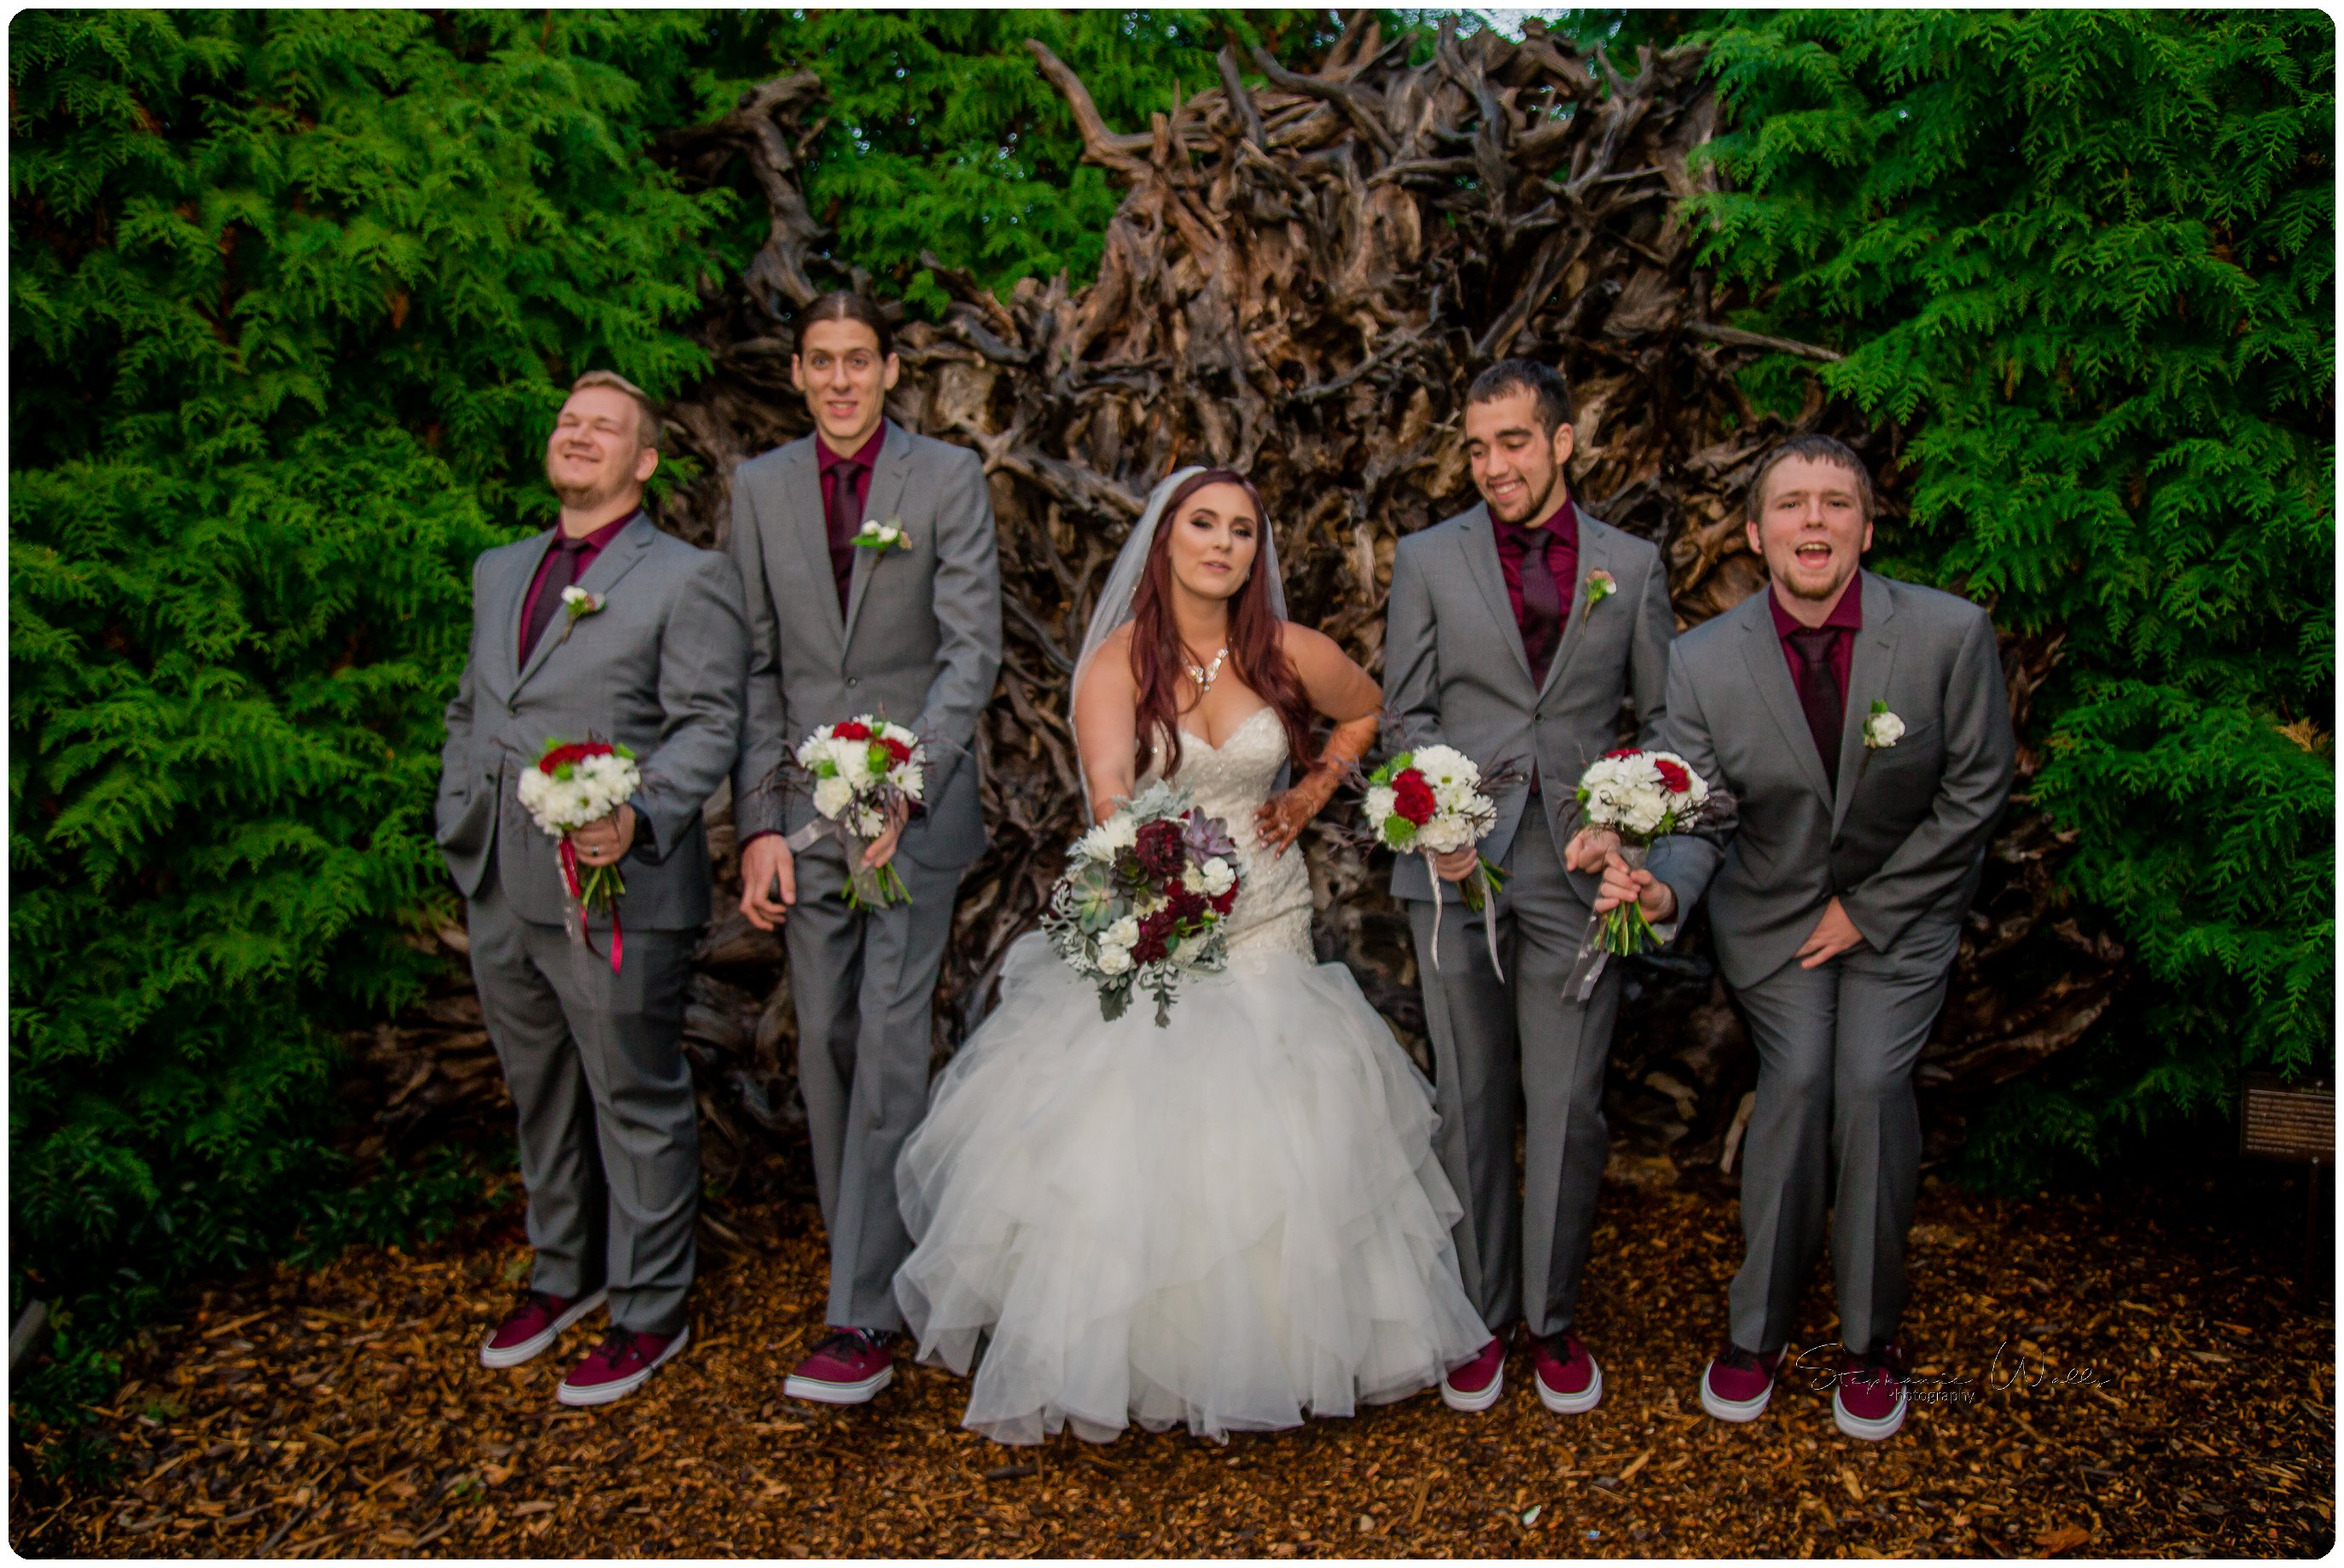 Wedding Party 020 Megan & Mo's Day 2   Willow Lodge Wedding   Woodinville, Wa Wedding Photographer